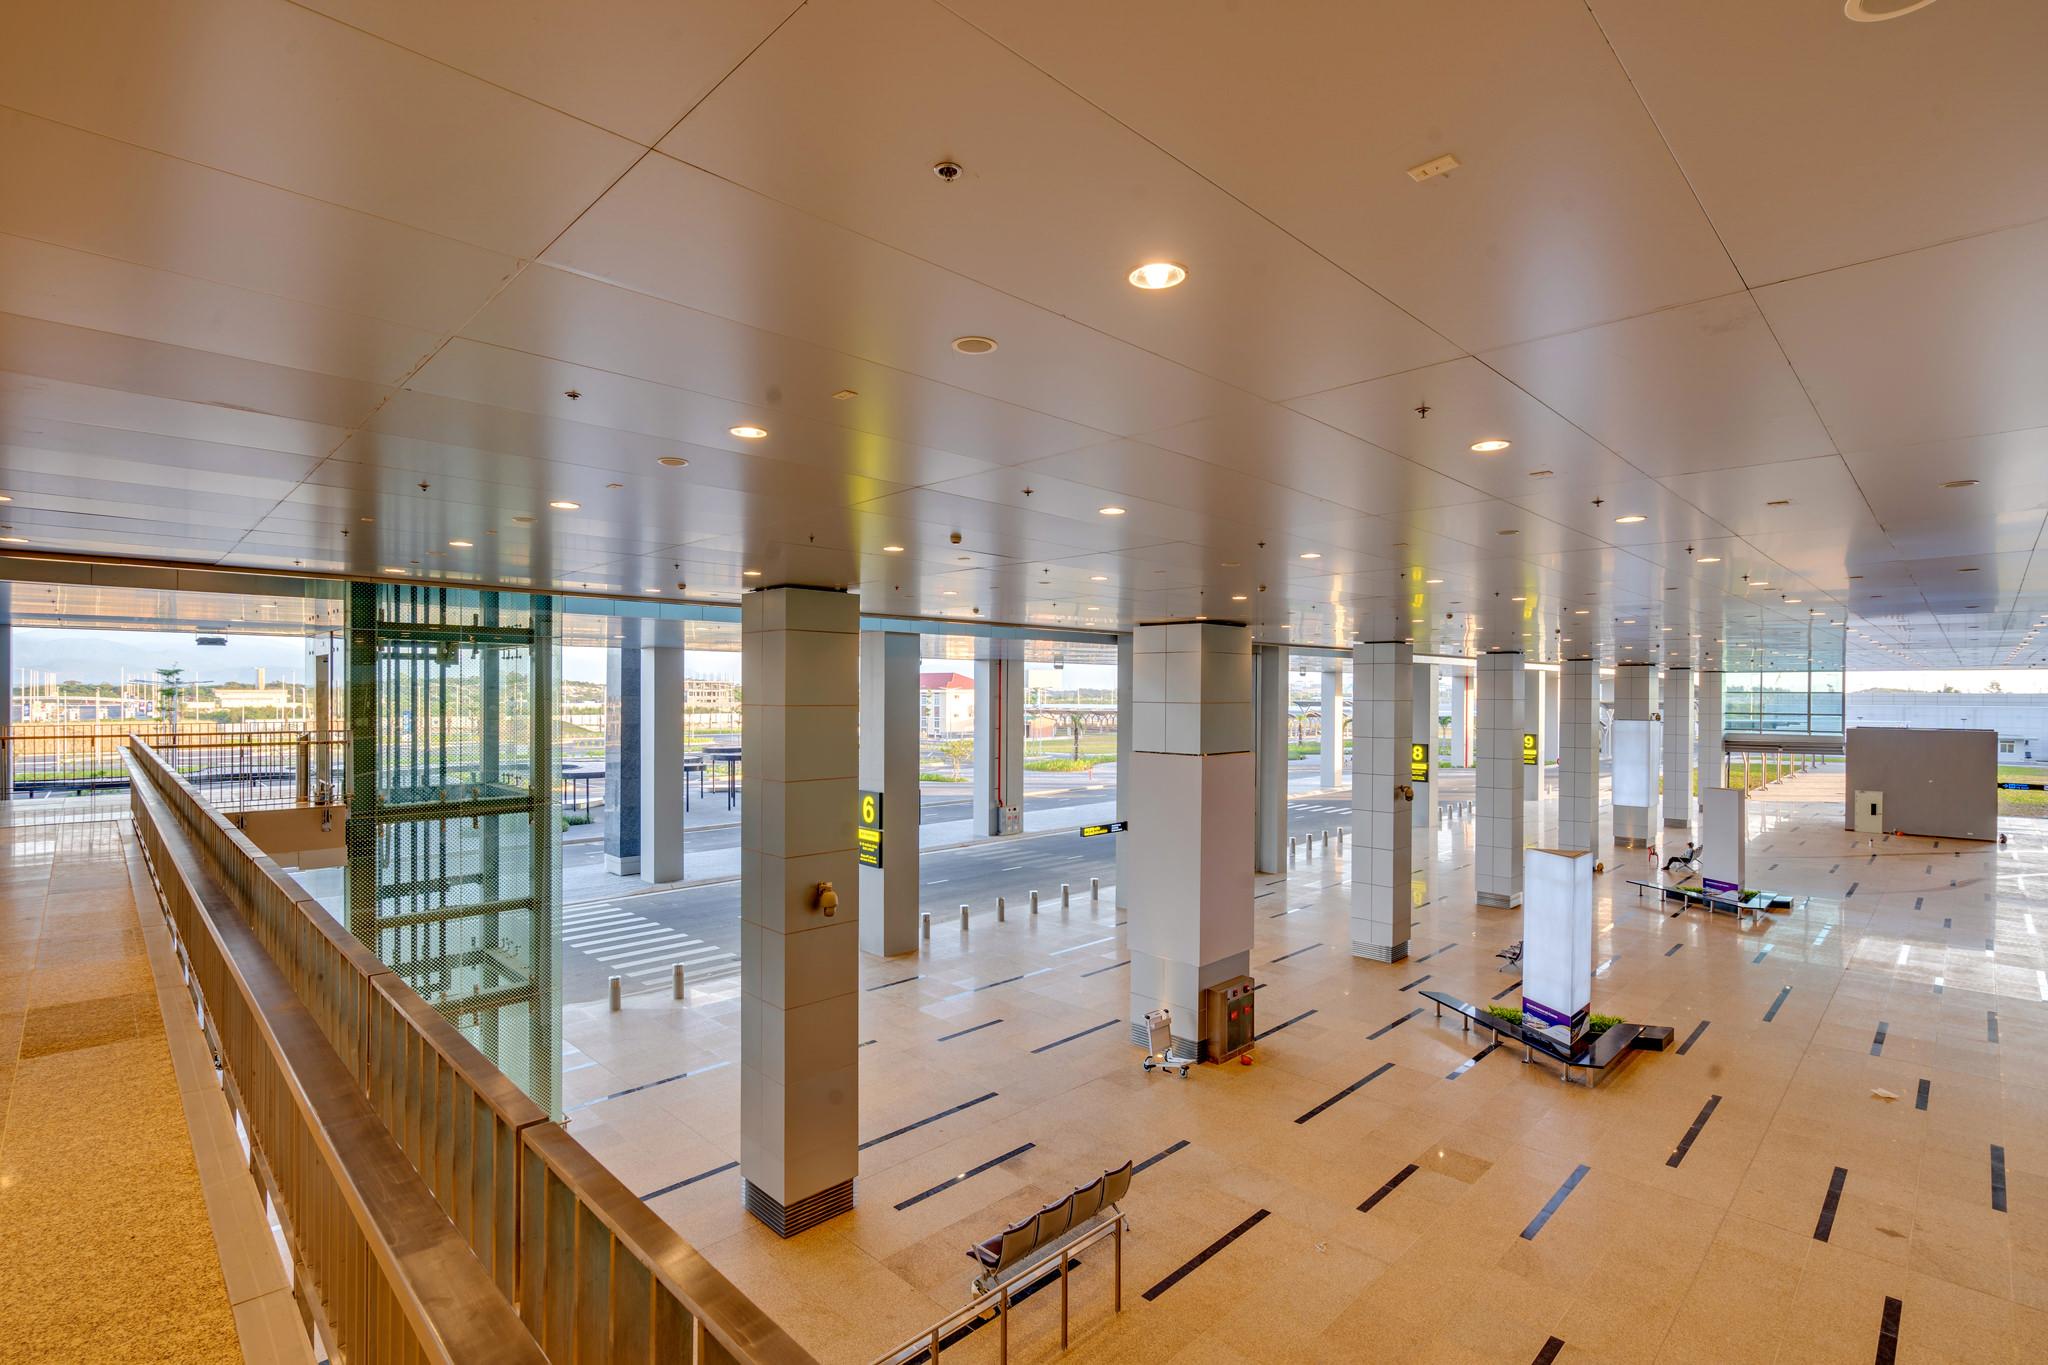 20180626 - Cam Ranh Airport - Architecture - 0050.jpg